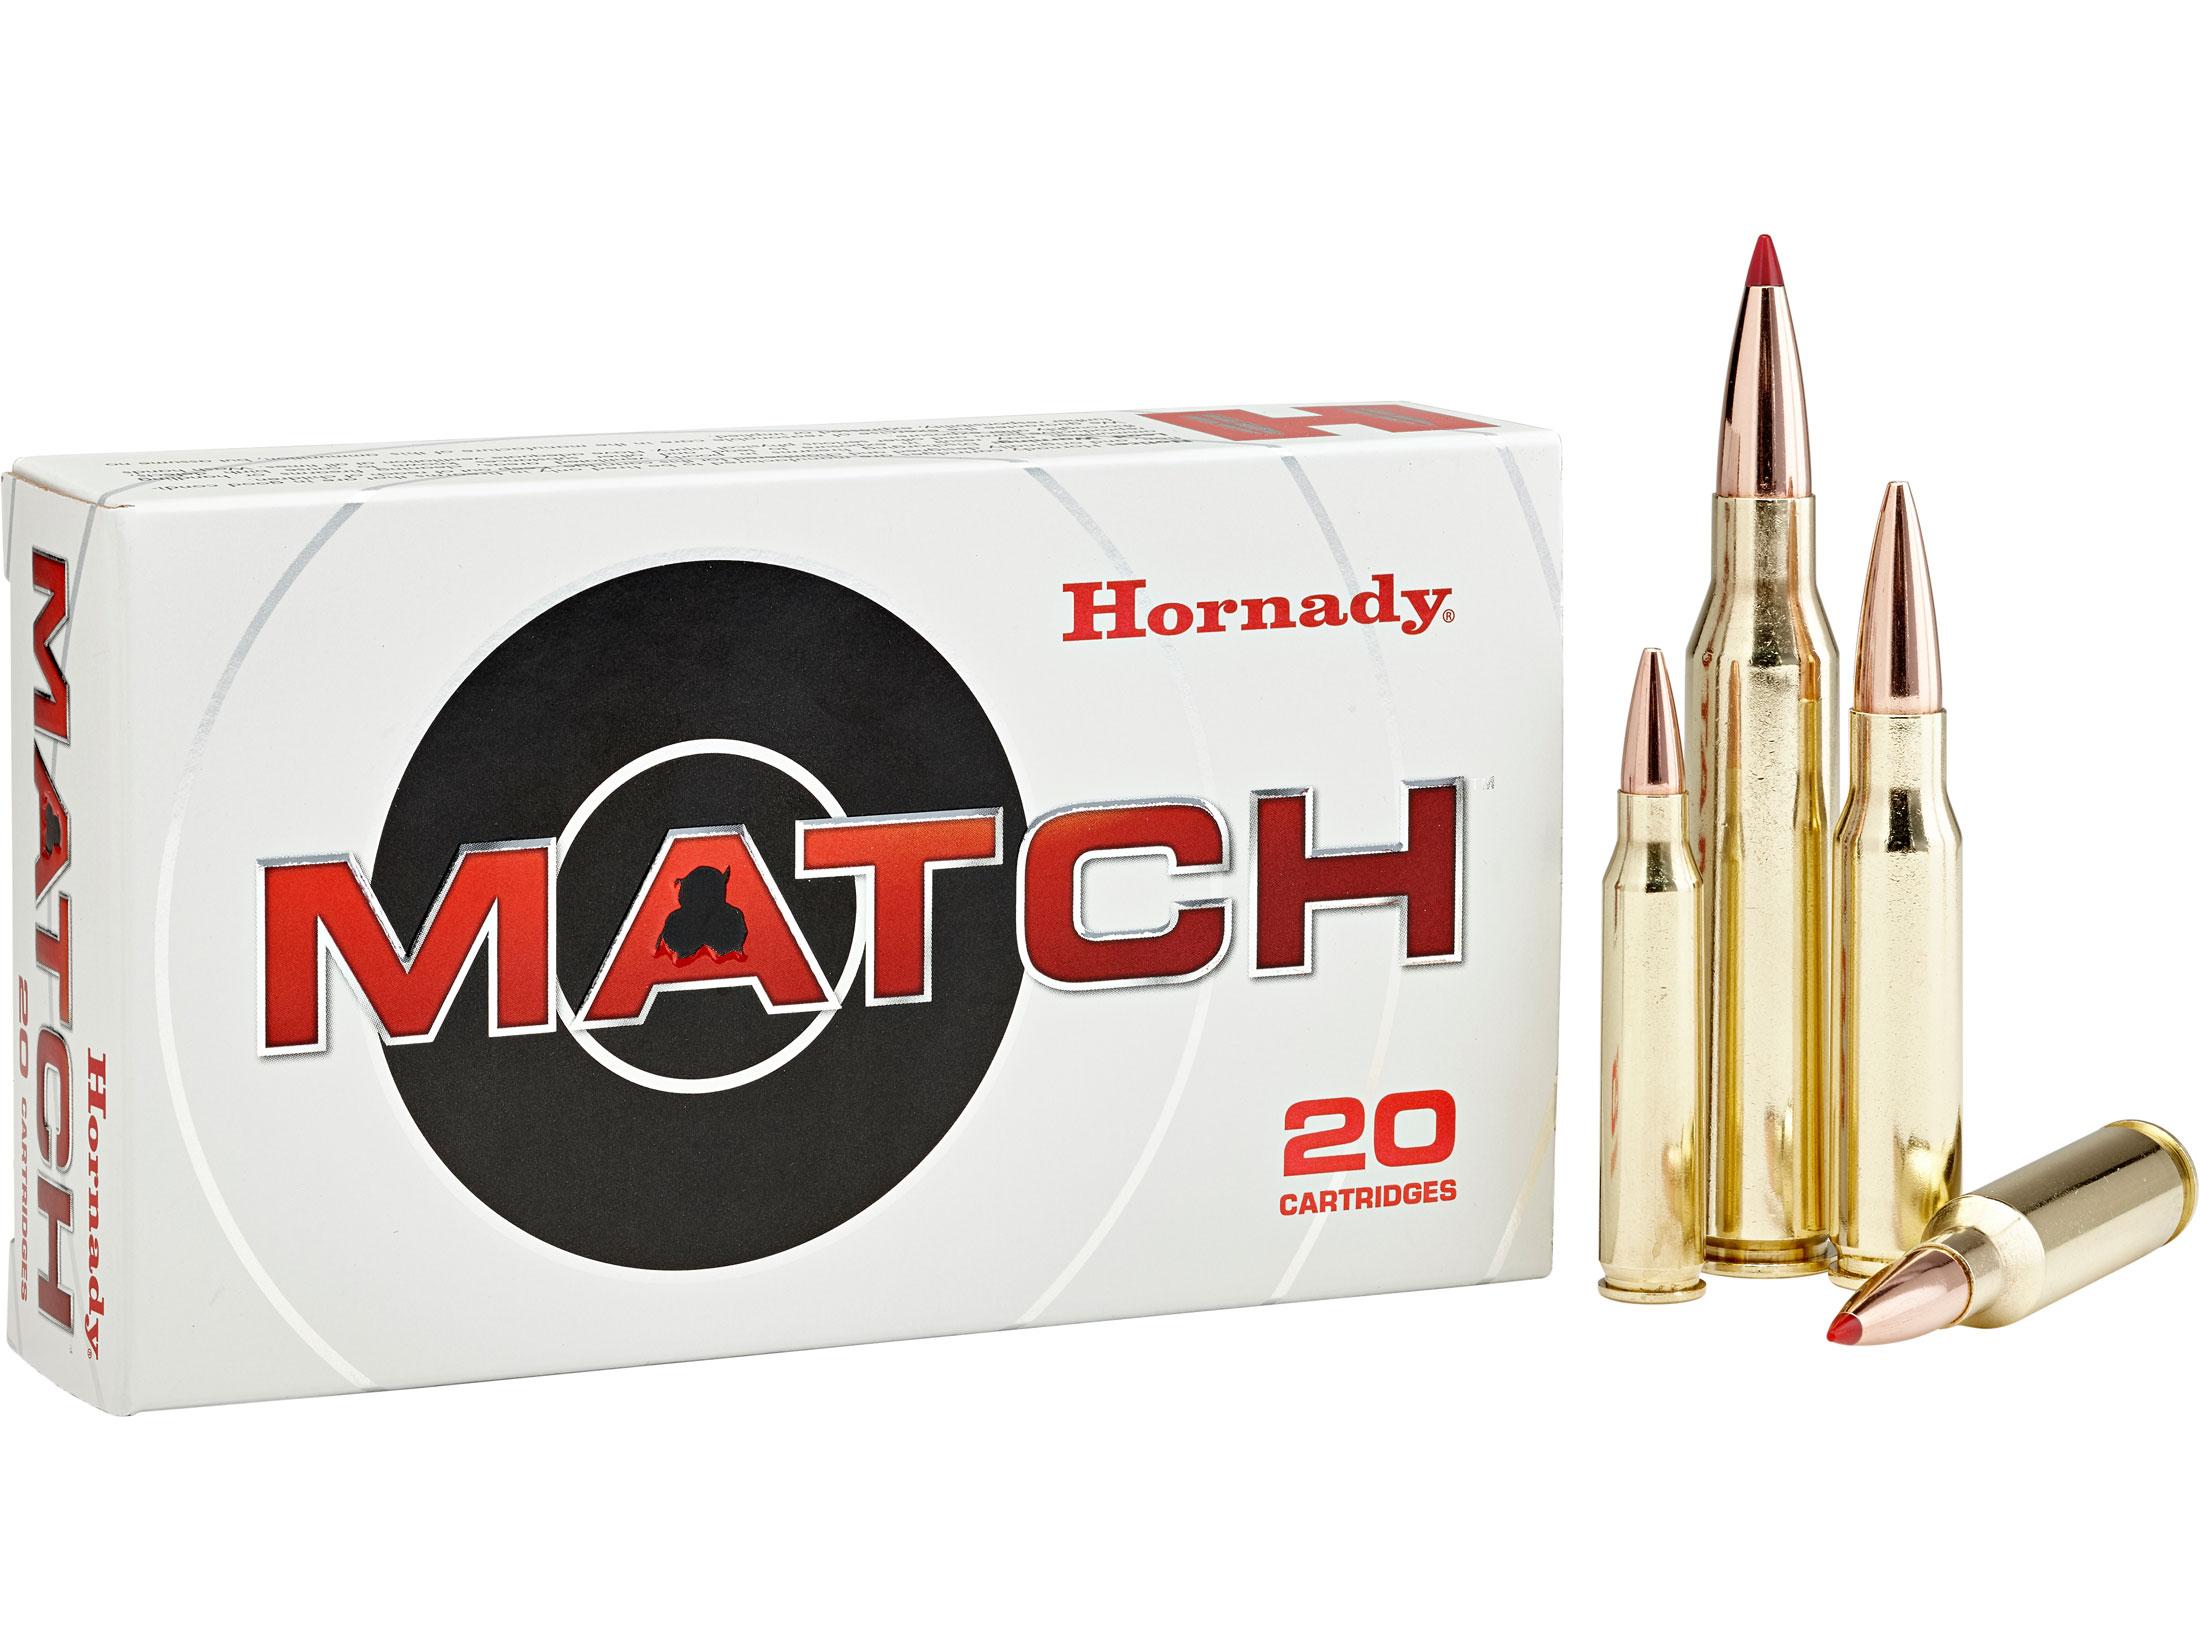 Hornady Match Ammo 6.5 Creedmoor 140 Grain ELD Match Box of 20